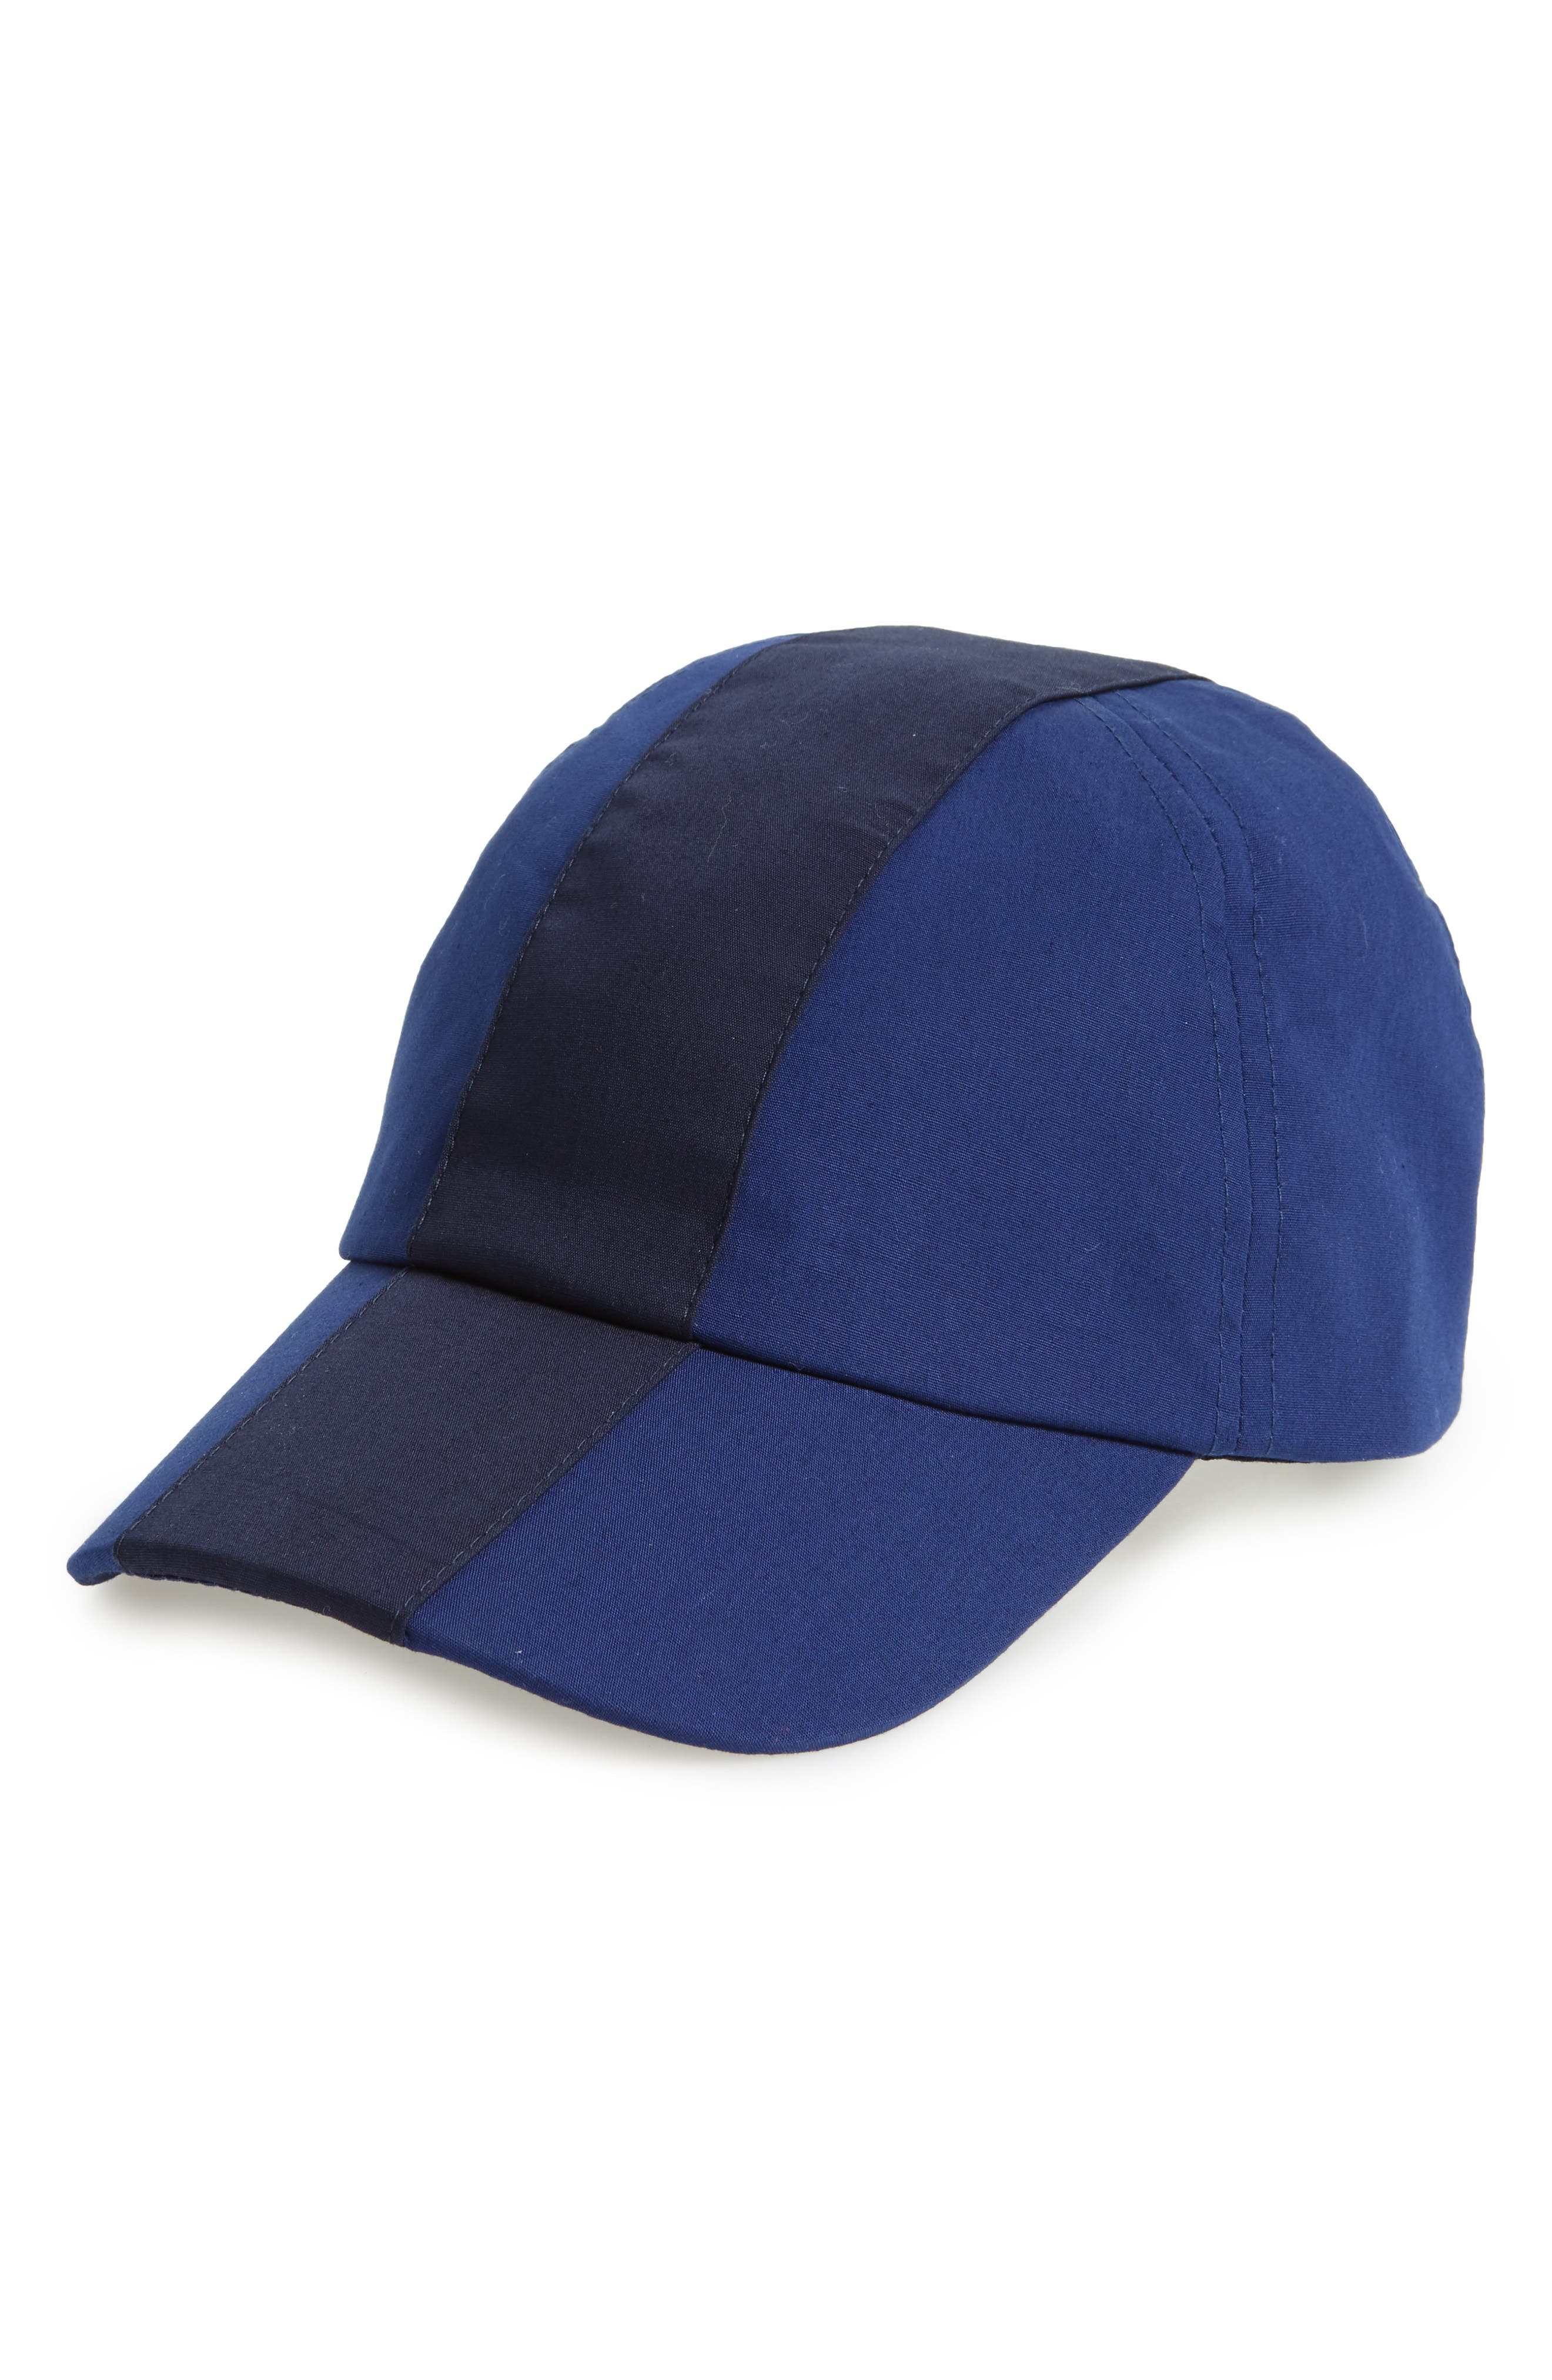 Colorblock Baseball Cap,                         Main,                         color, Methylene/ Navy Blue